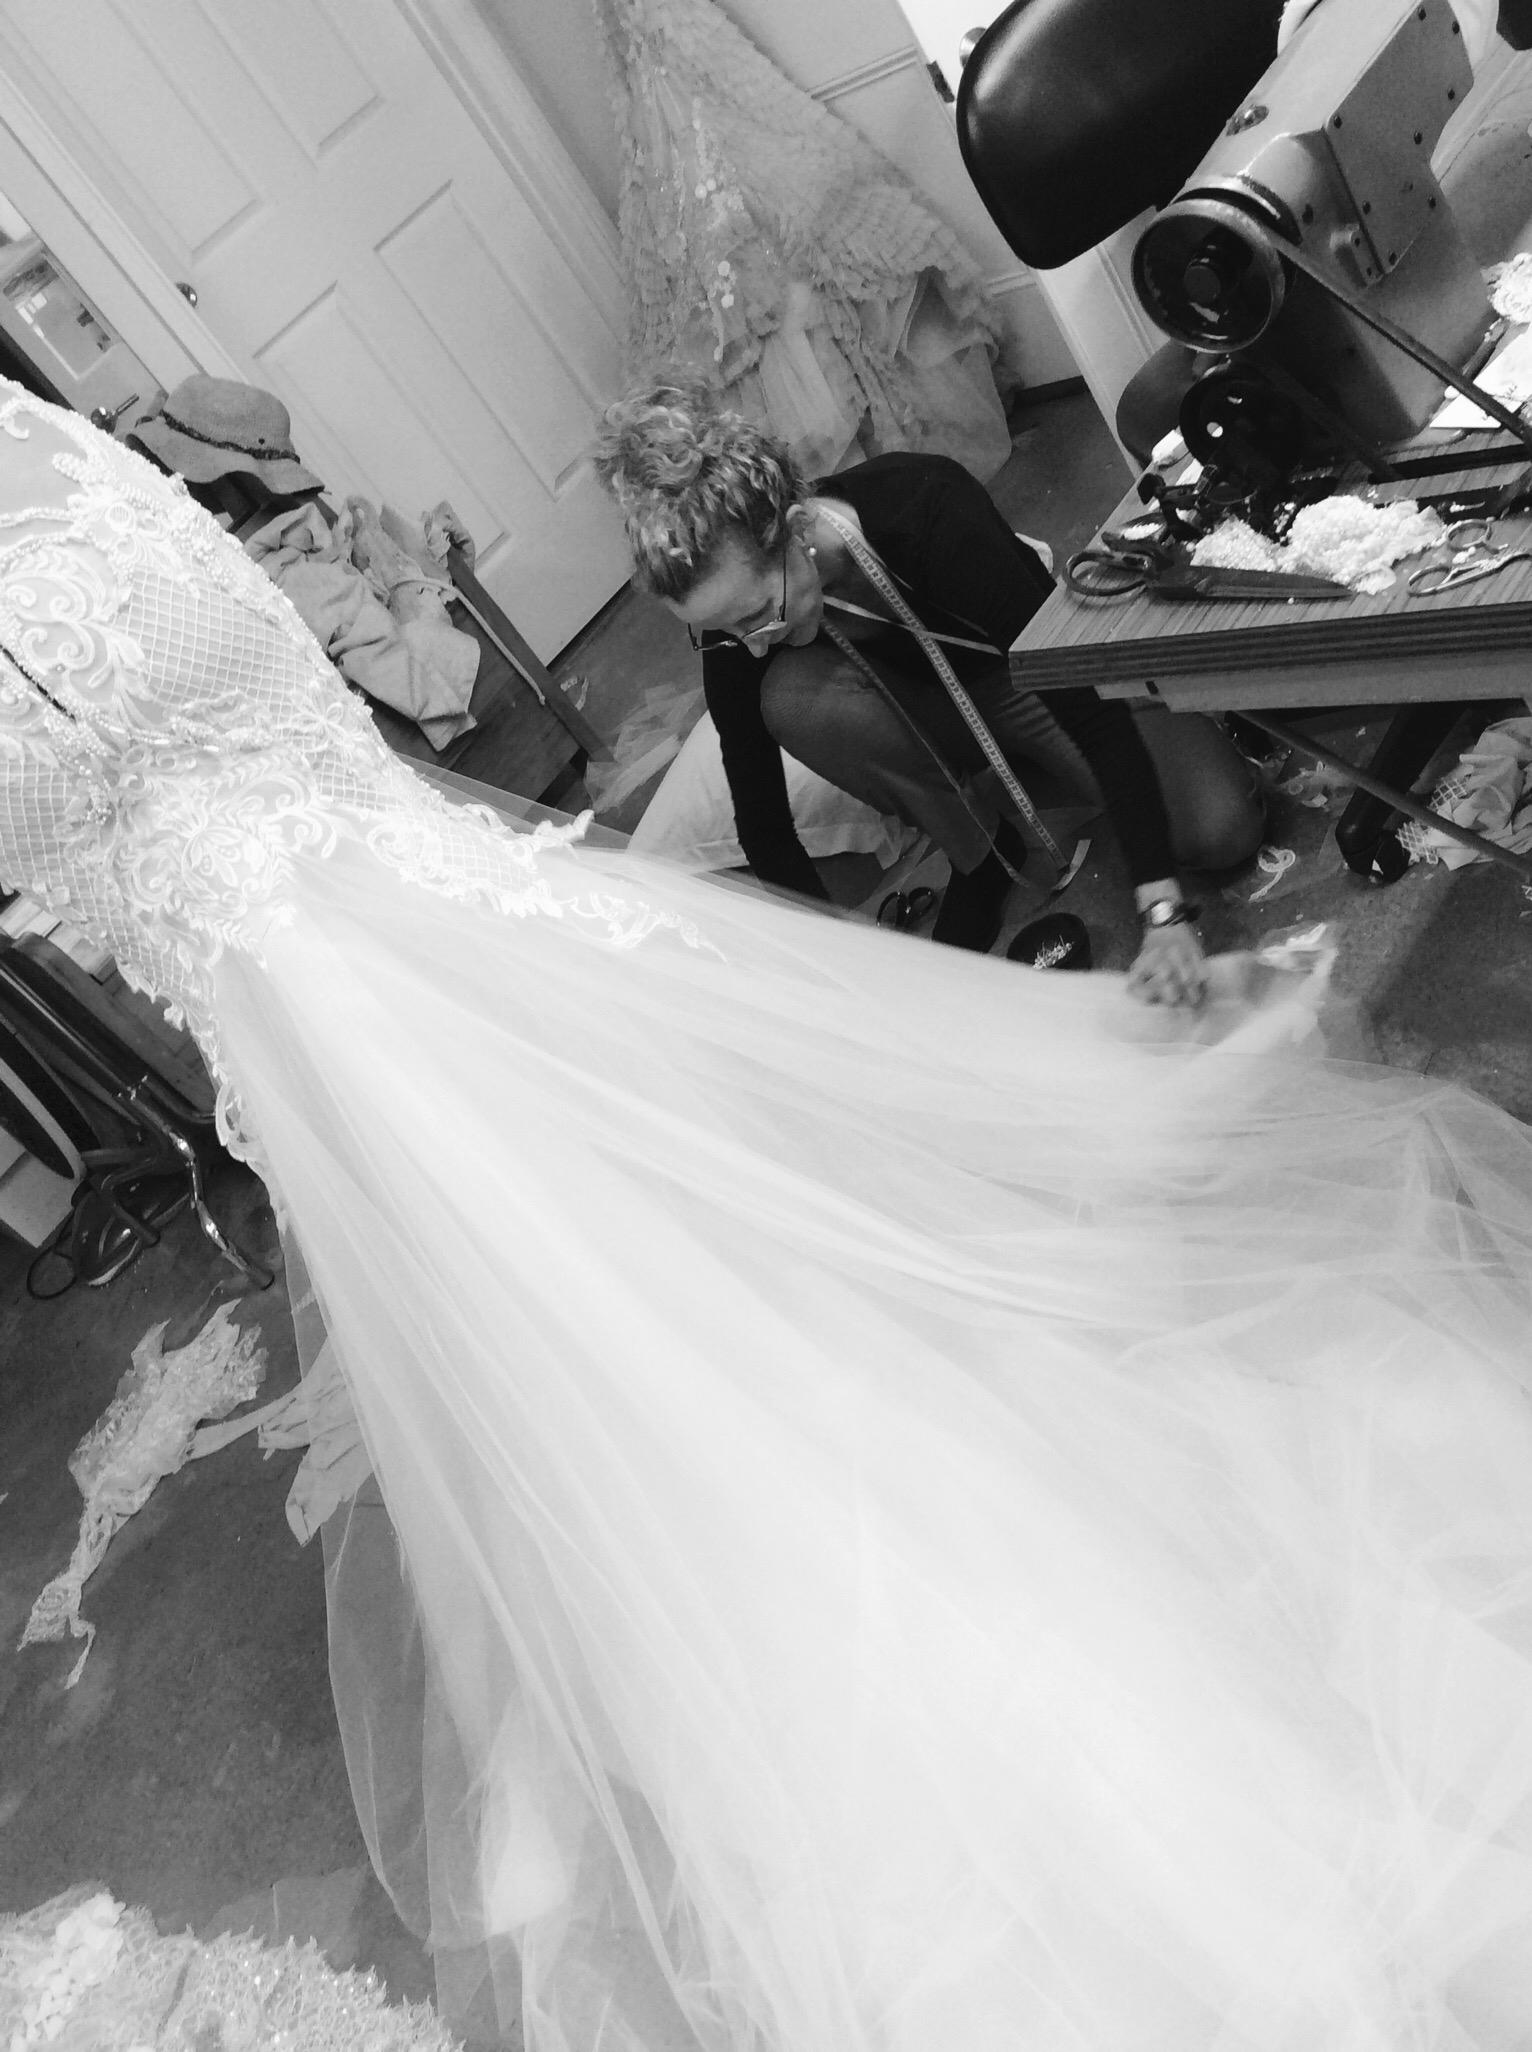 MXM Couture Wedding Dress Designer Sewing in Studio Yesterday Creative Letterpress Blog Post